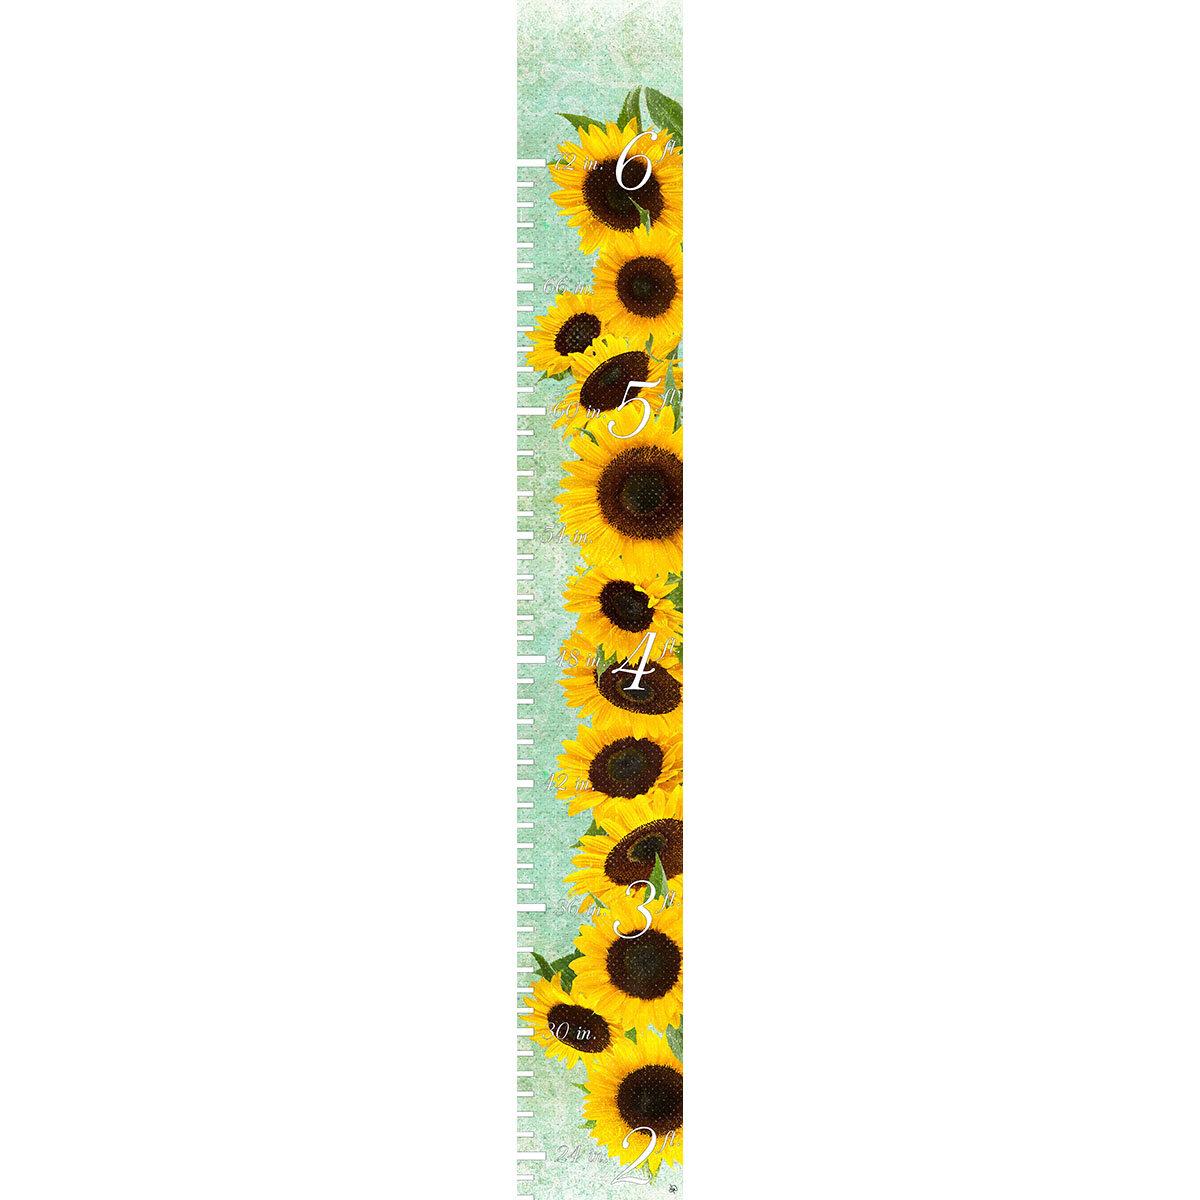 Harriet Bee Ines Sunflowers Personalized Growth Chart Wayfair